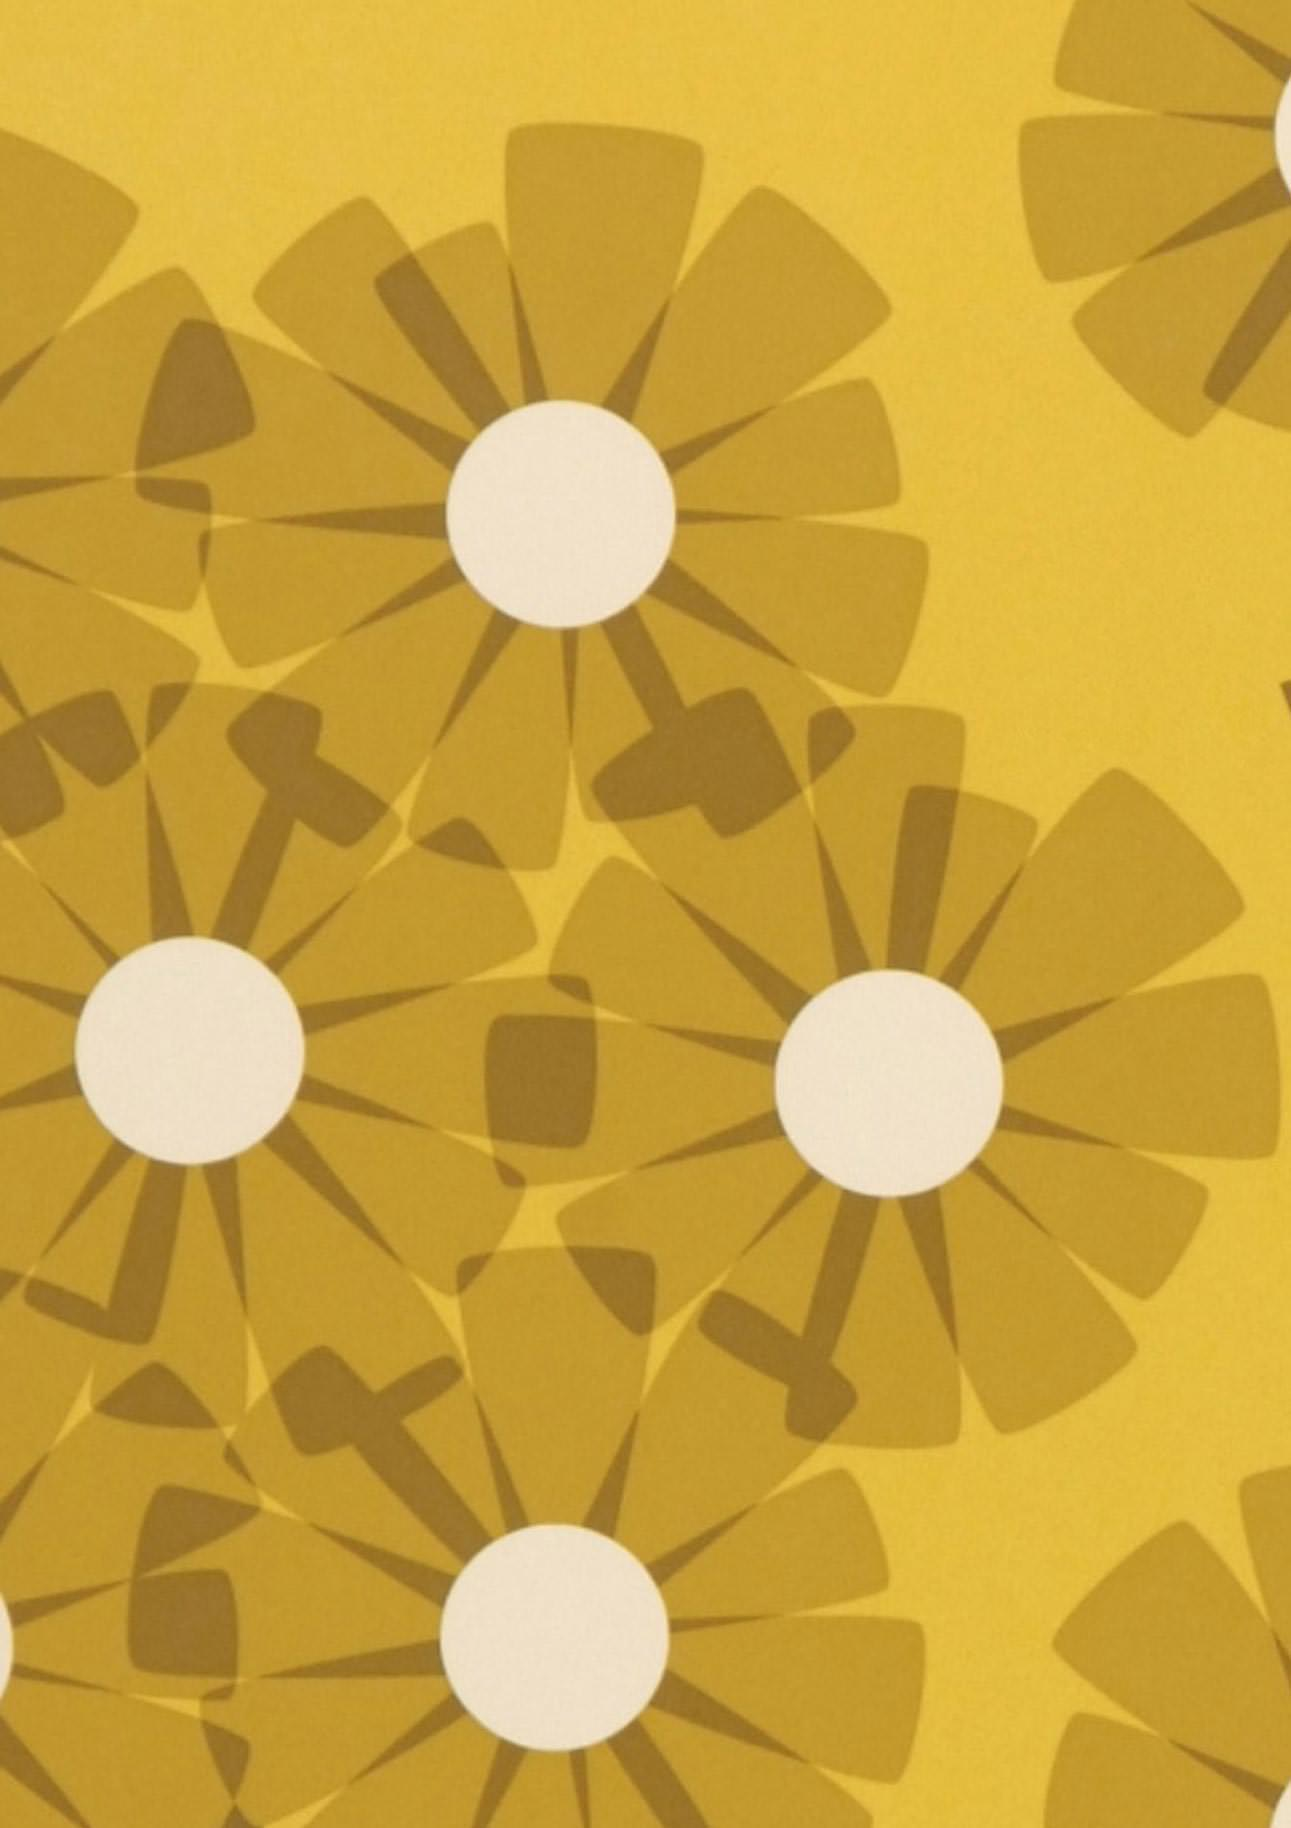 Tapete ostara honiggelb cremeweiss graubraun sandgelb for Tapete nach hause